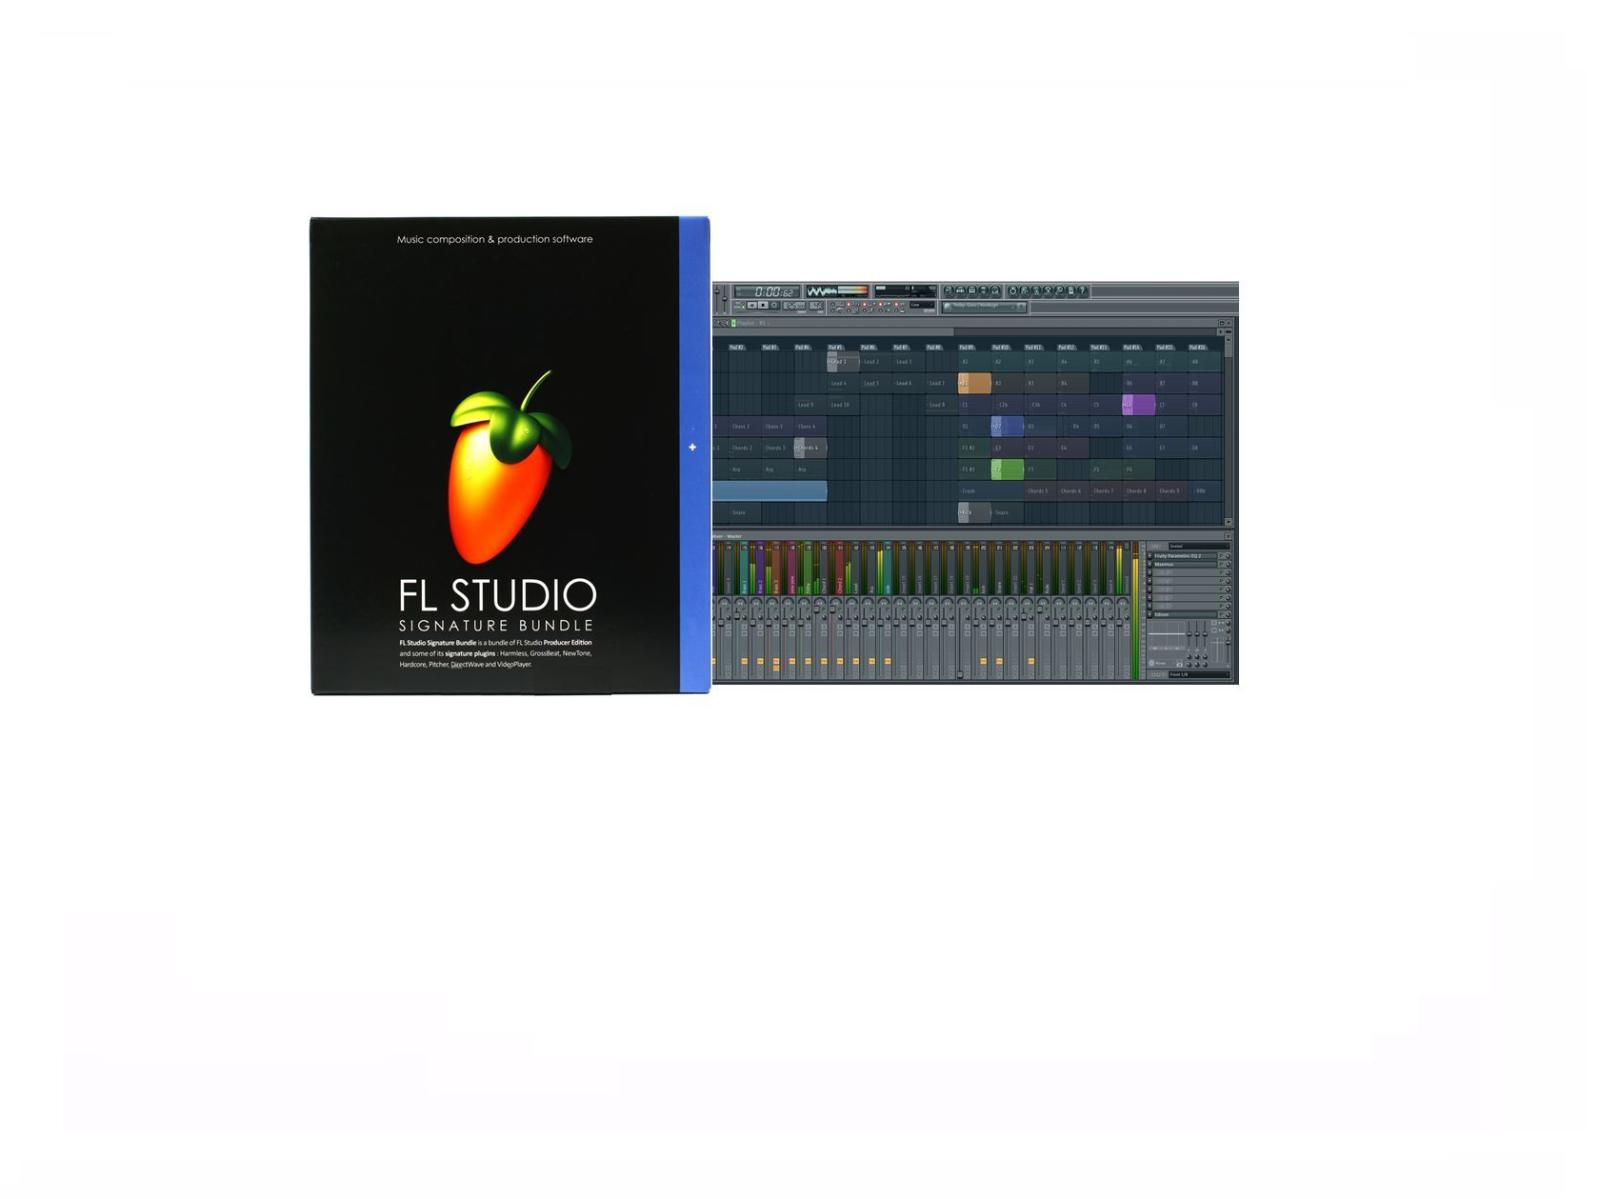 FL STUDIO 20 FRUITY LOOPS SIGNATURE MUSIC SOFTWARE RETAIL MAC LICENSE Sierra+Hig